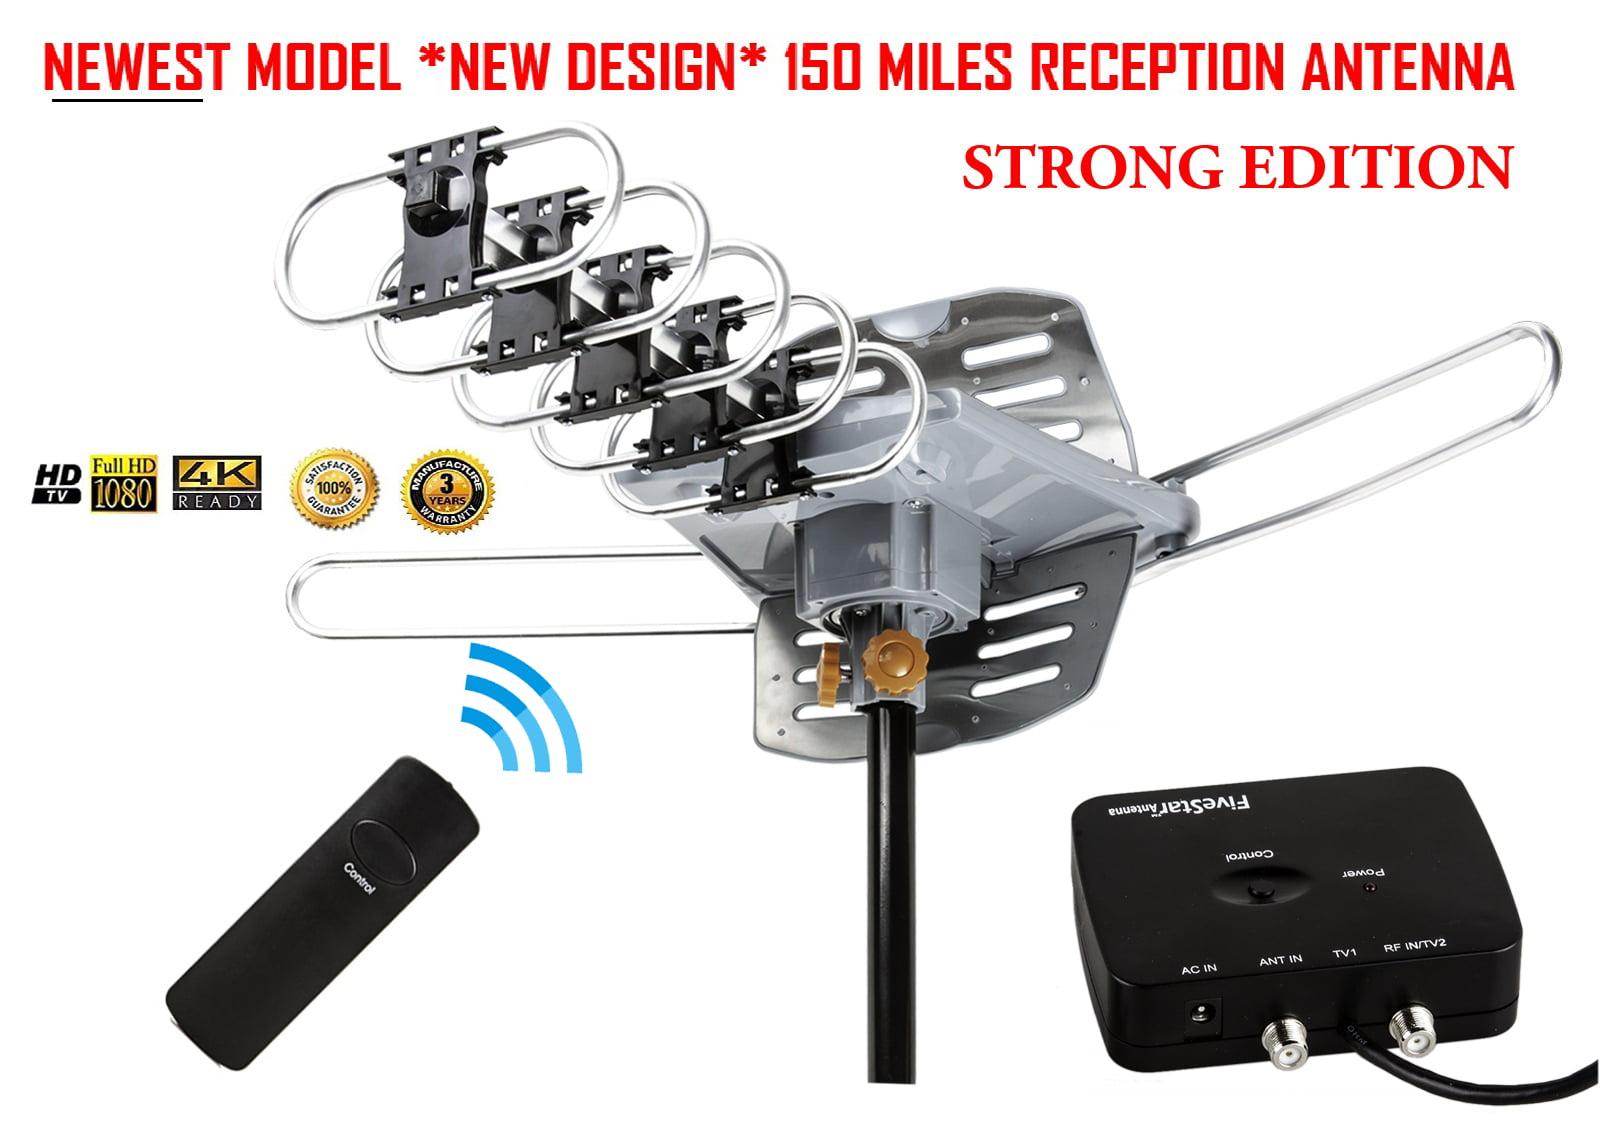 150 Mile Wild Range Outdoor TV Antenna Up to 150 Miles ...